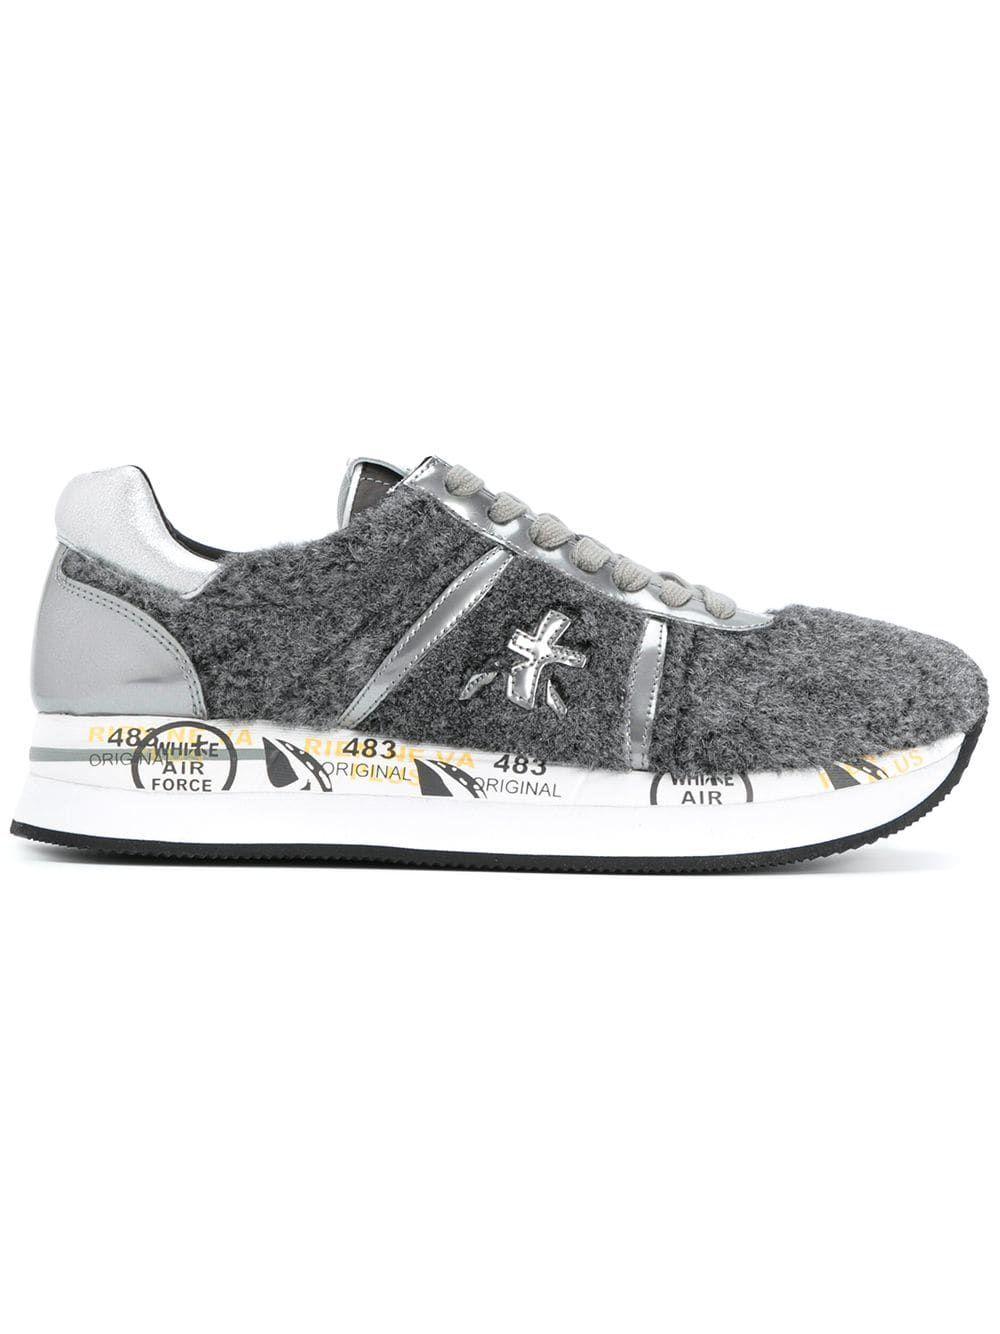 Shoes PREMIATA Conny PREMIATA Shoes Conny PREMIATA sneakers Conny PREMIATA PREMIATA sneakers Conny PREMIATA sneakers Shoes PREMIATA fqFfPX6